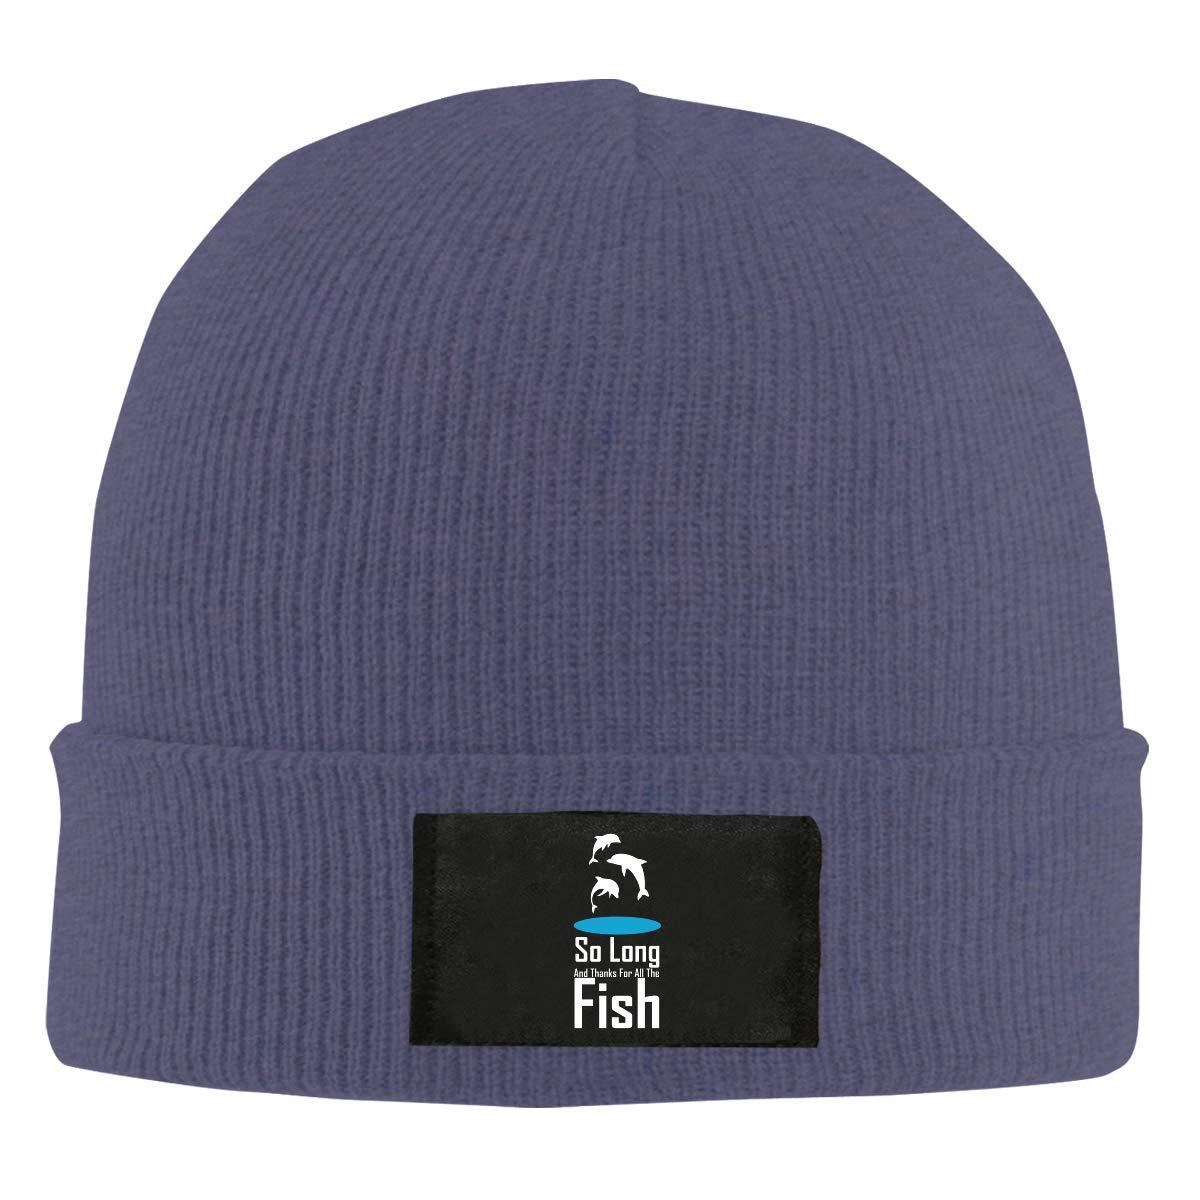 LRHUI So Long Fish Winter Knitted Hat Warm Wool Skull Beanie Cap